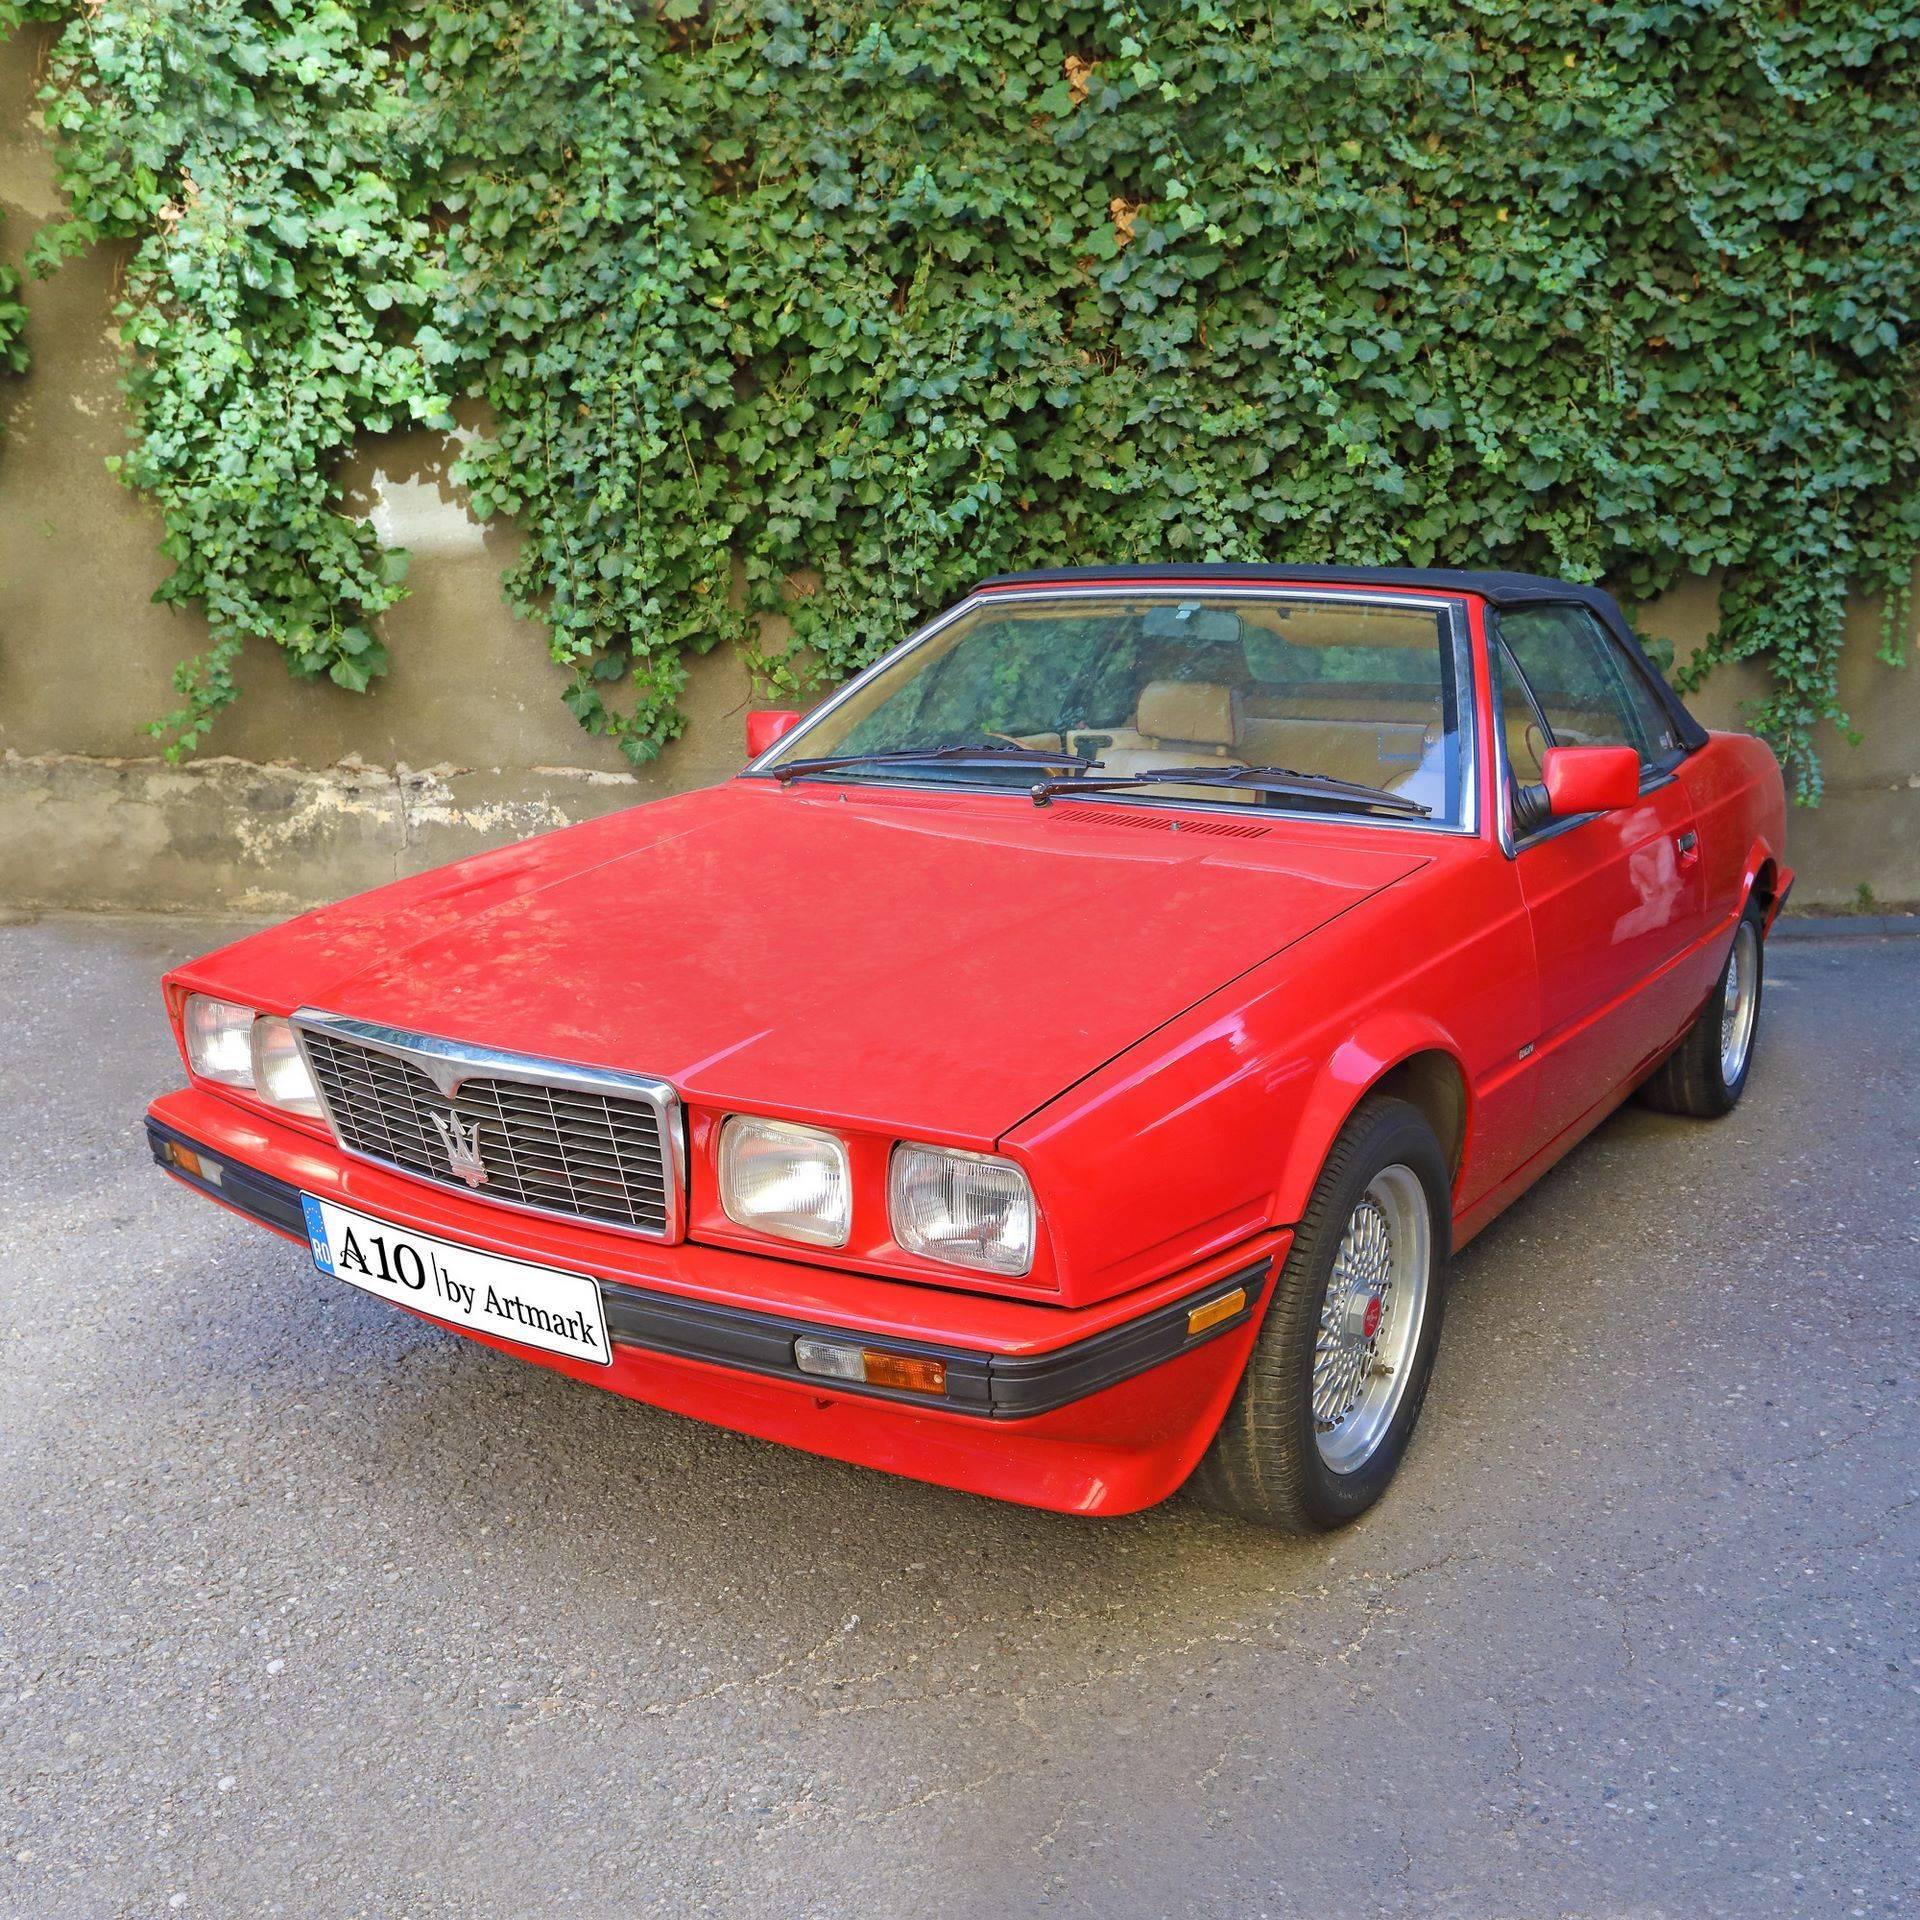 Maserati-Biturbo-Spyder-Elton-John-1